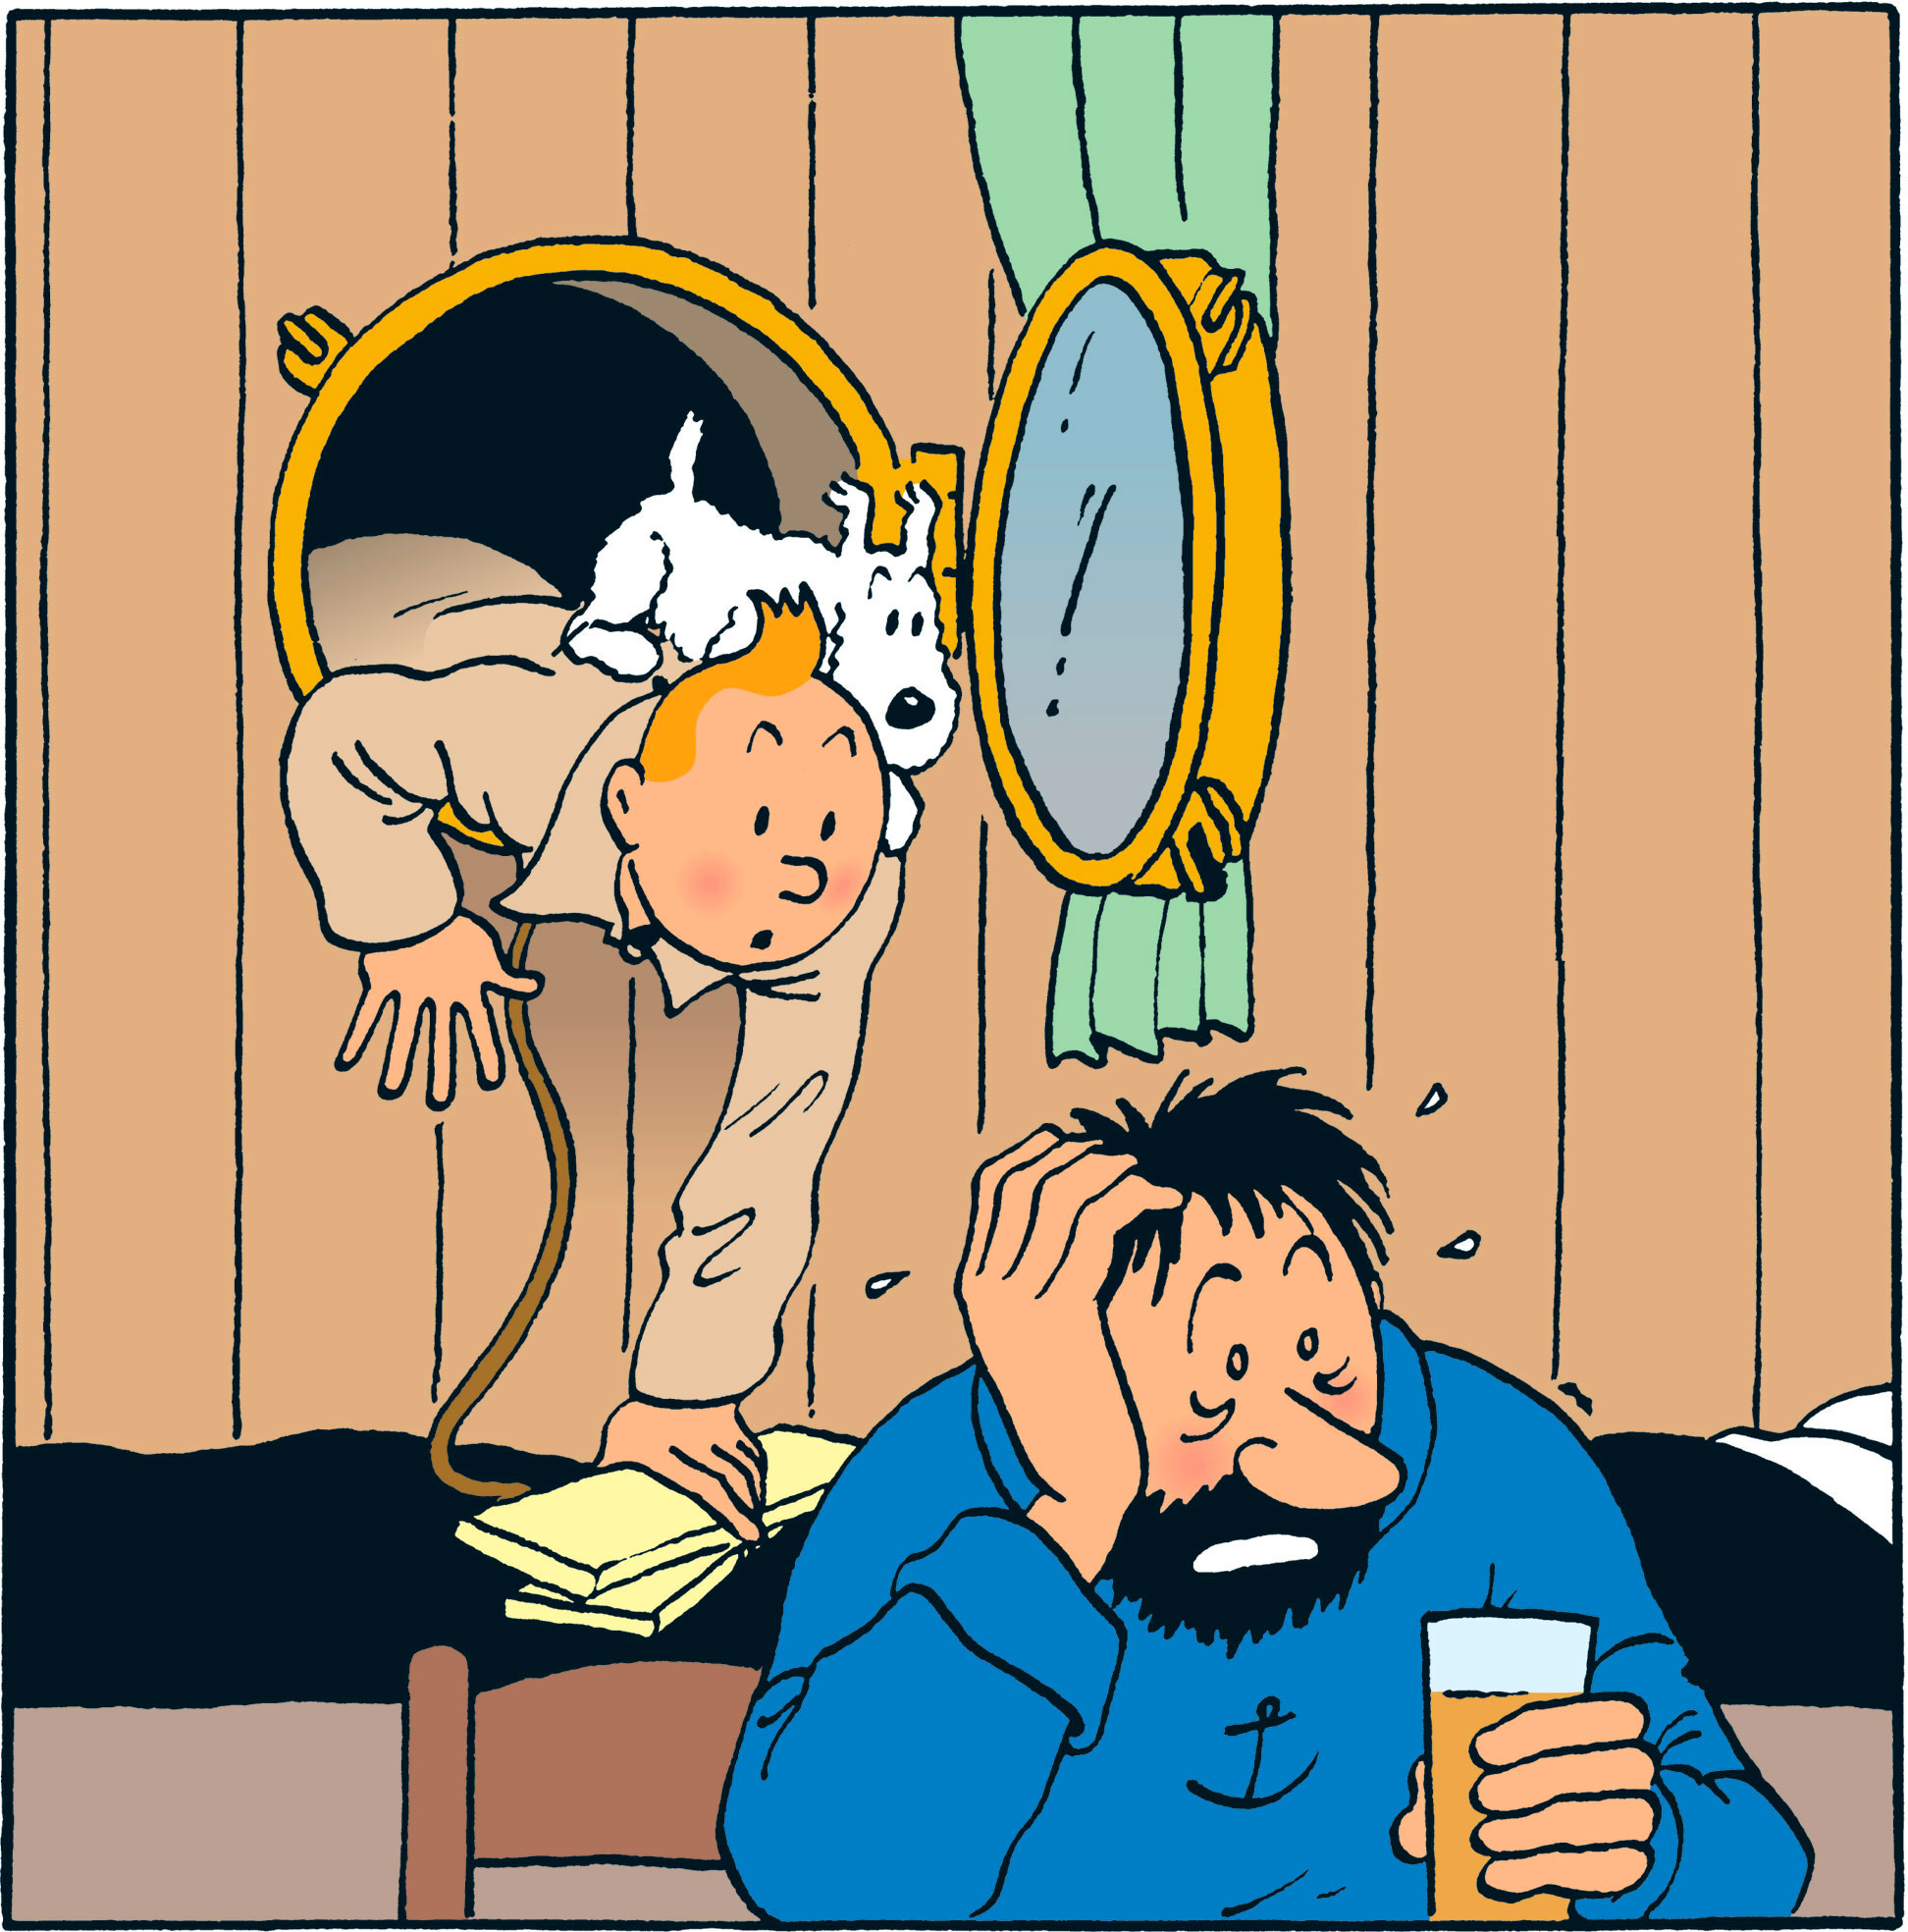 Première rencontre Tintin et Haddock